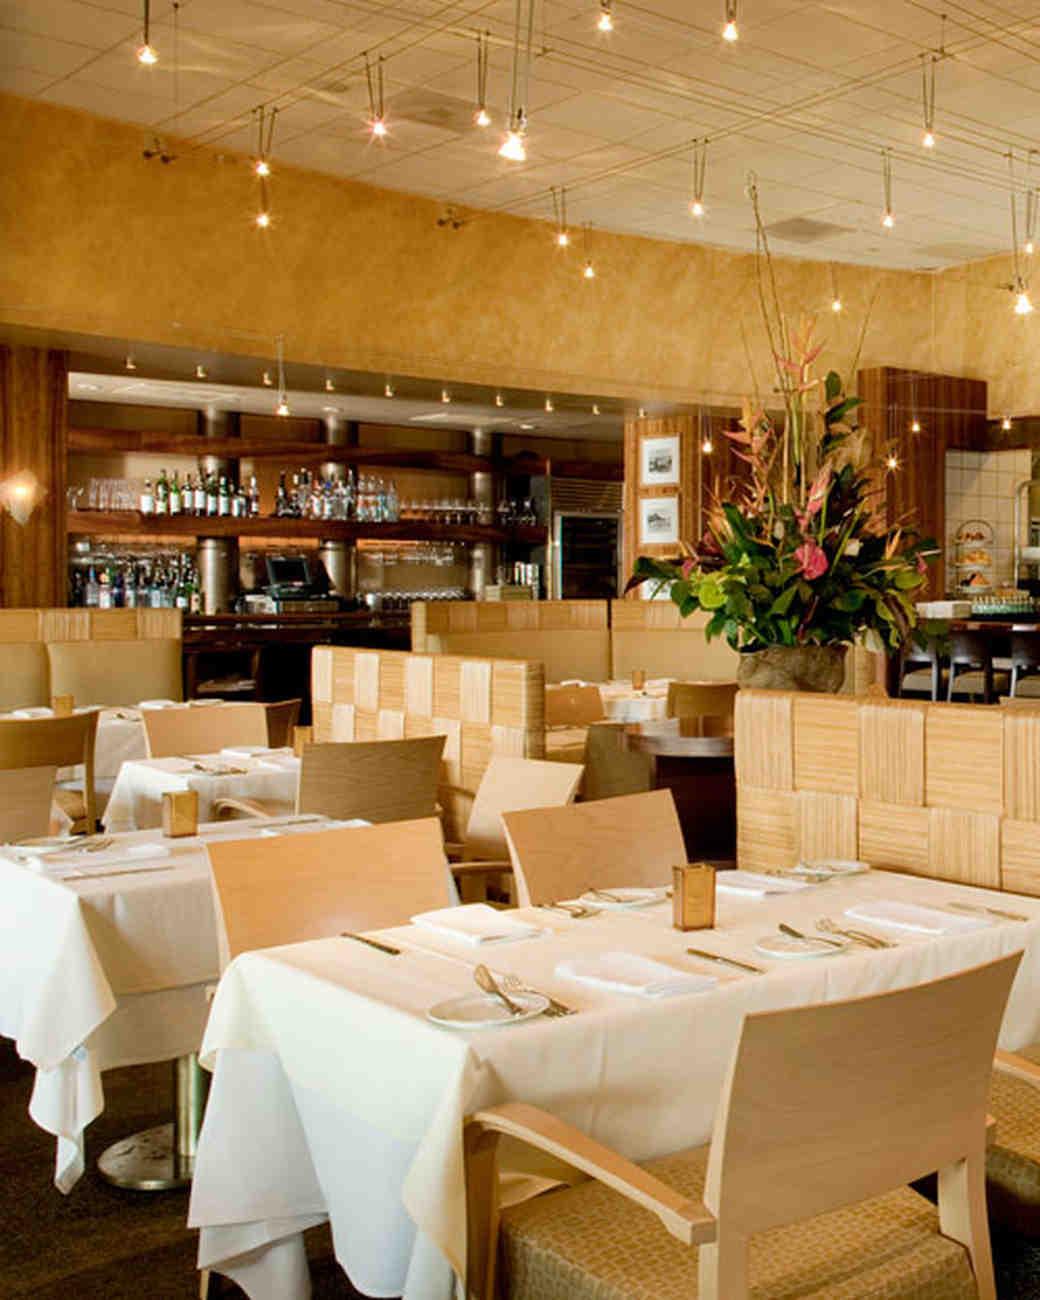 mwd_0111_restaurant_alan-wong.jpg